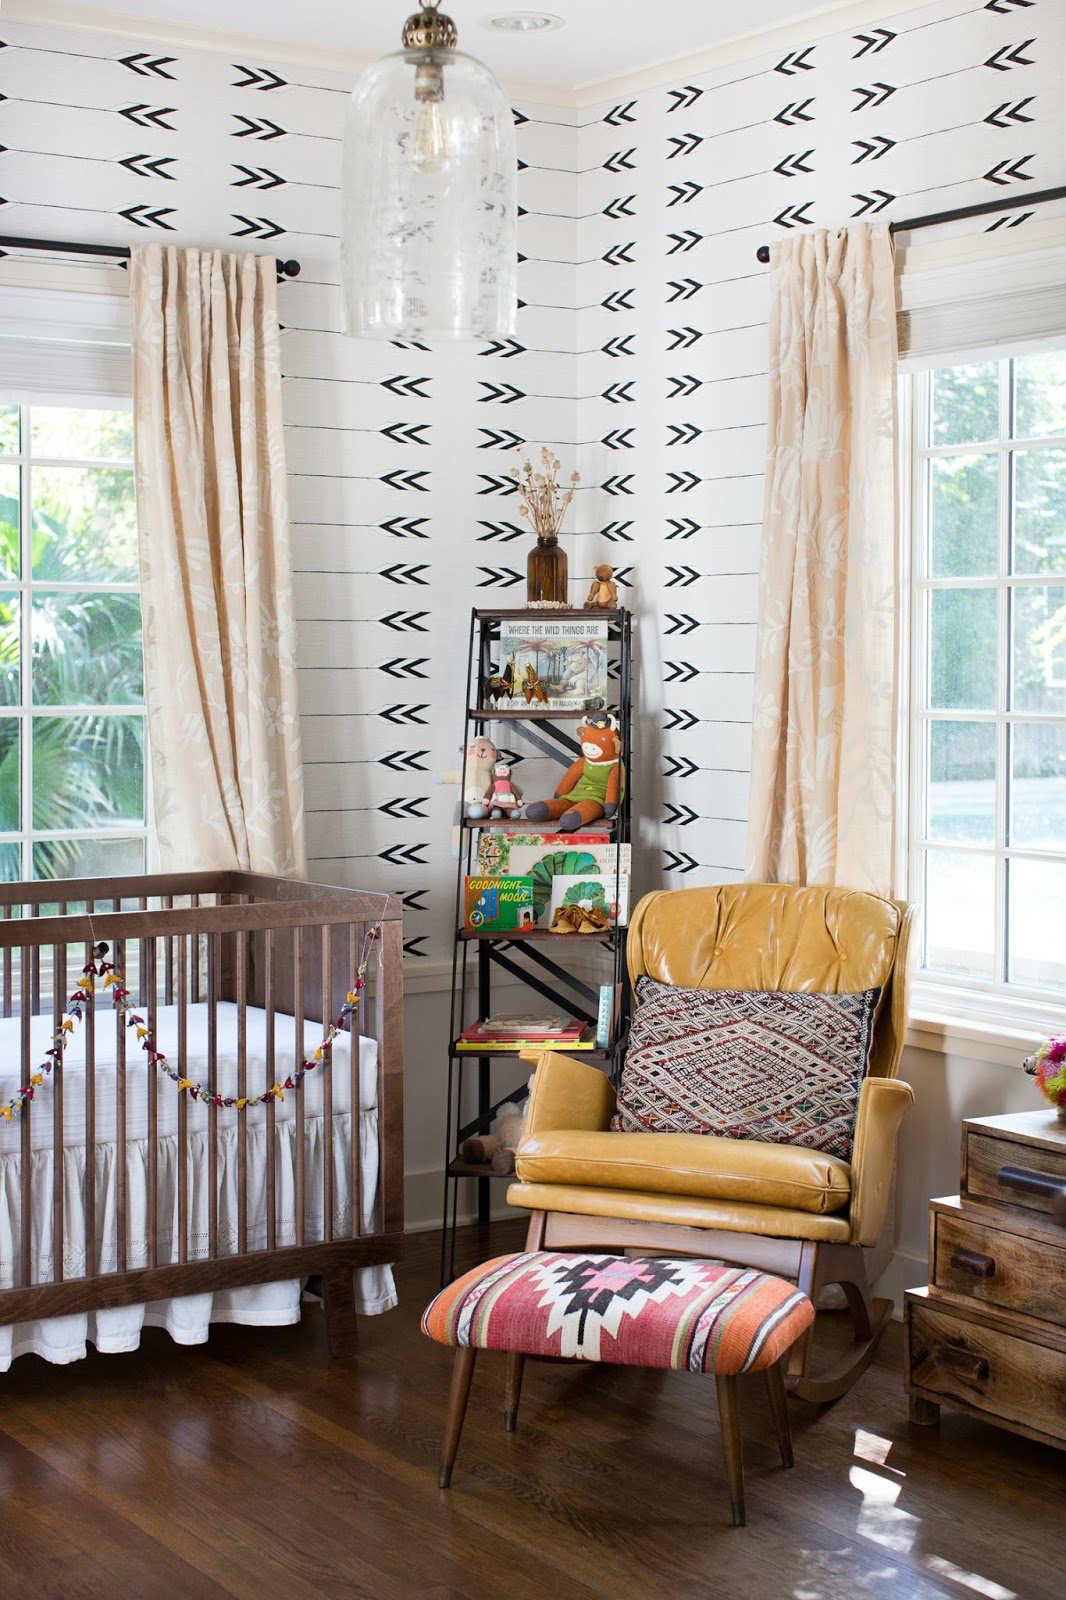 Vintage kids room with a balanced but versatile interior